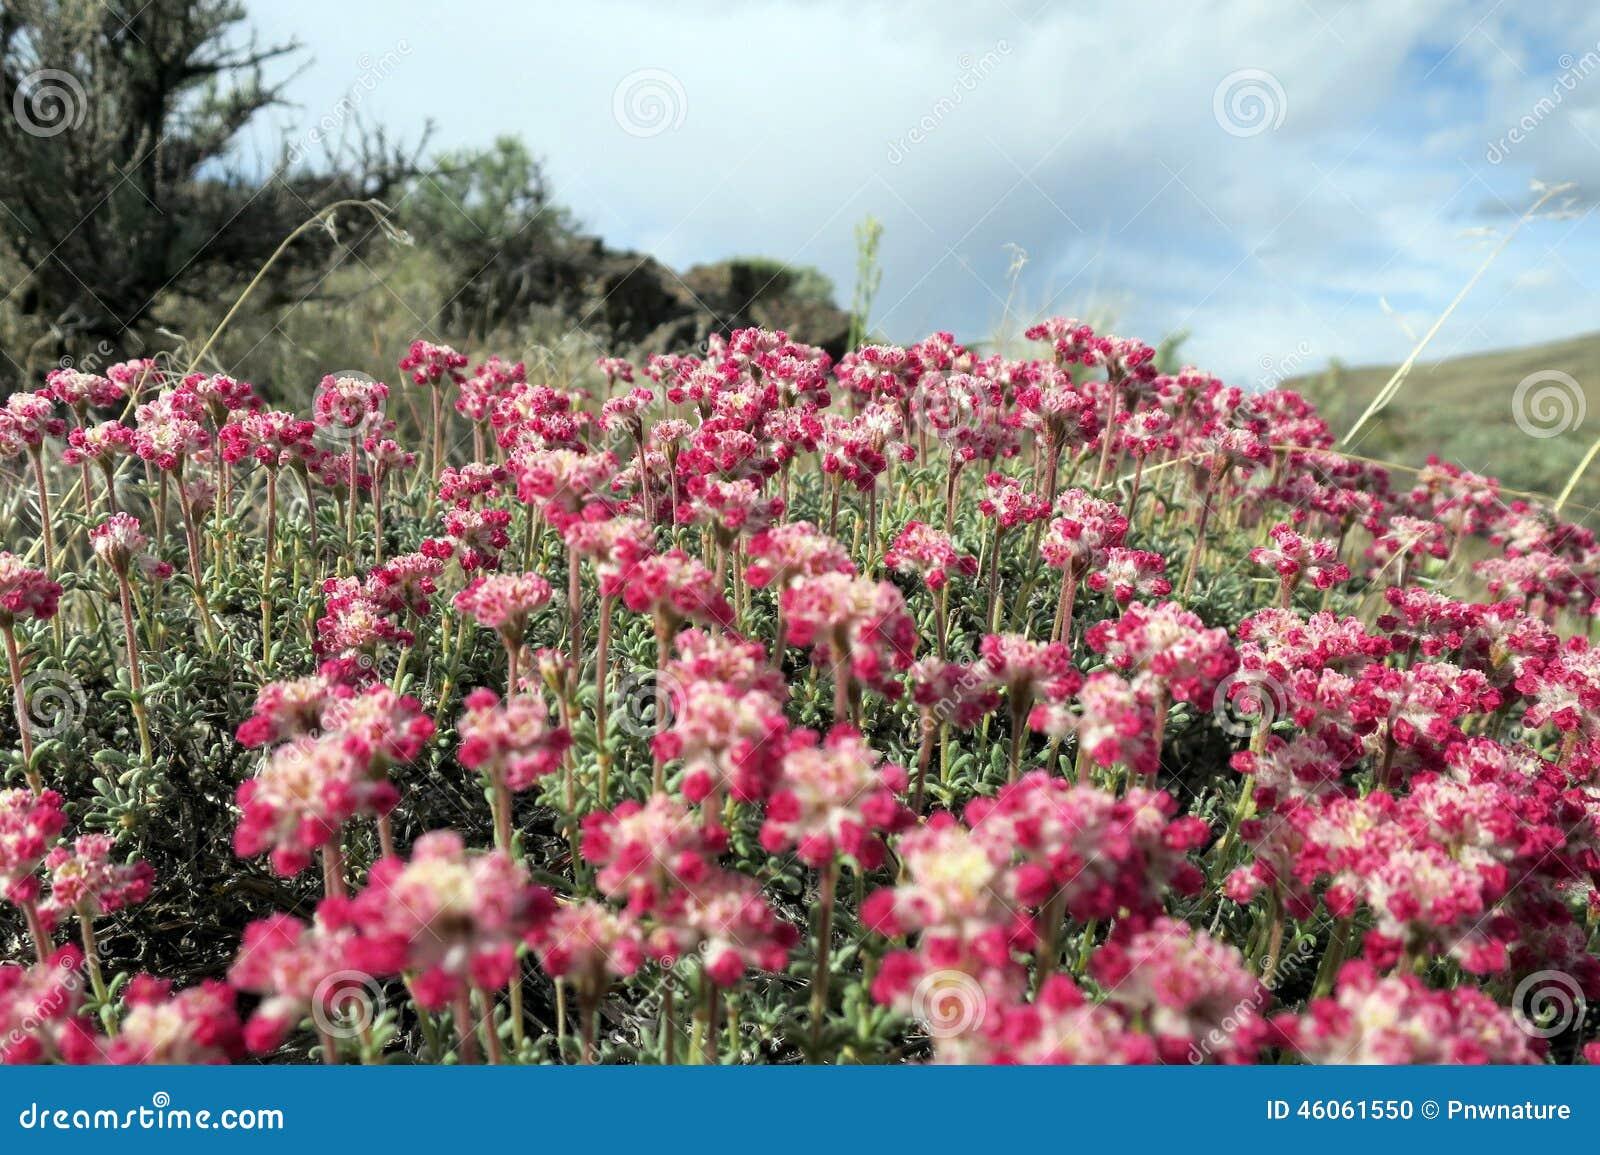 fleurs de sarrasin de thym photo stock image 46061550. Black Bedroom Furniture Sets. Home Design Ideas